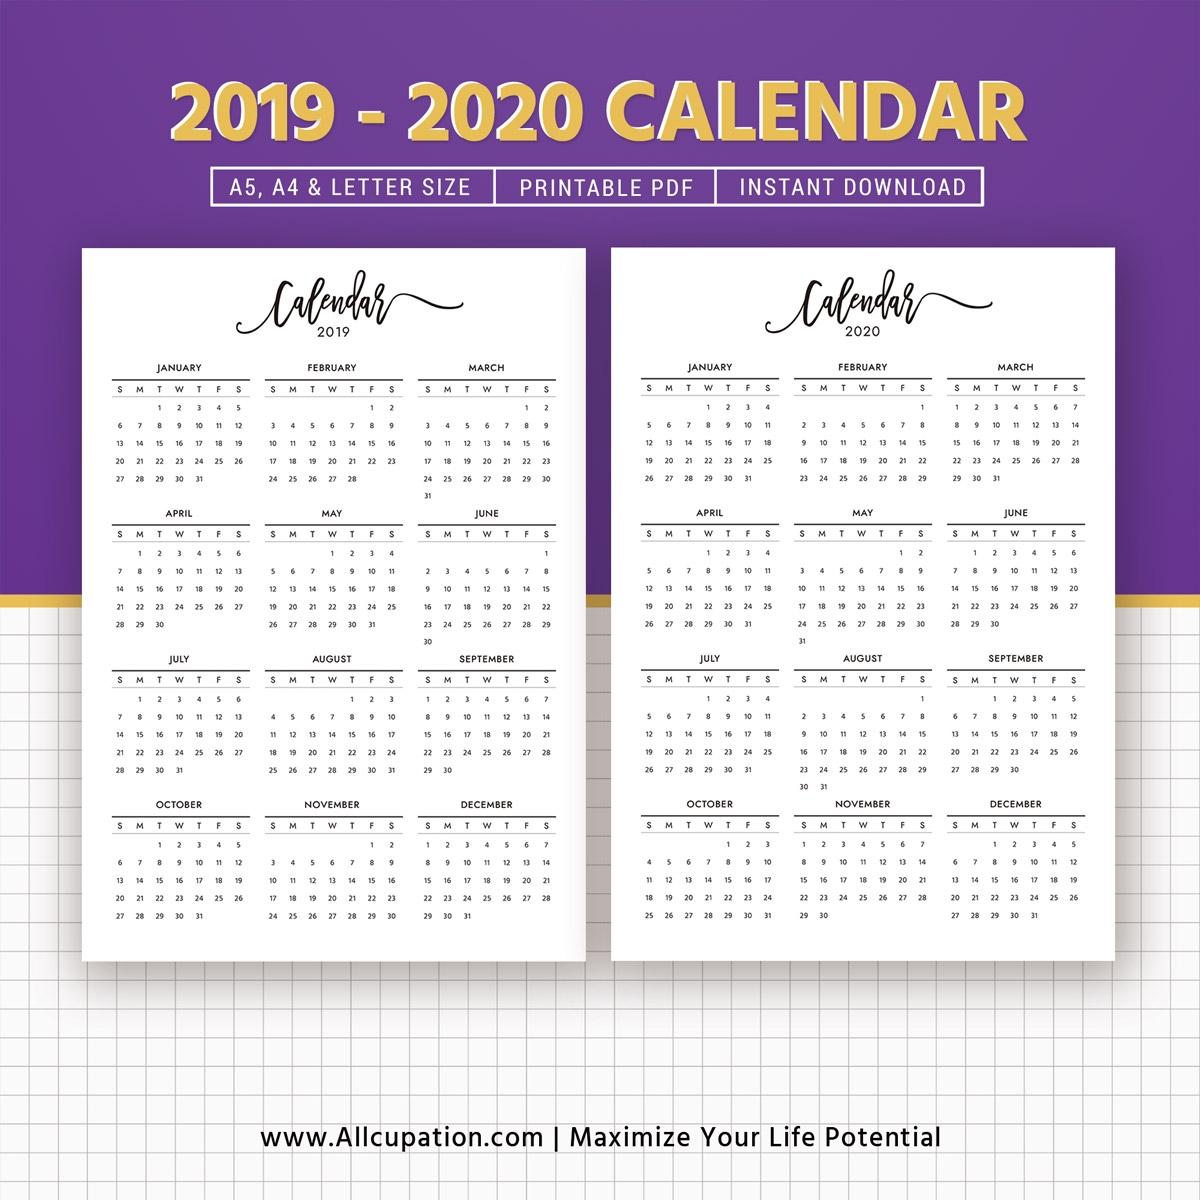 2019 2020 Calendar Printable Calendar Planner Design Best Planner